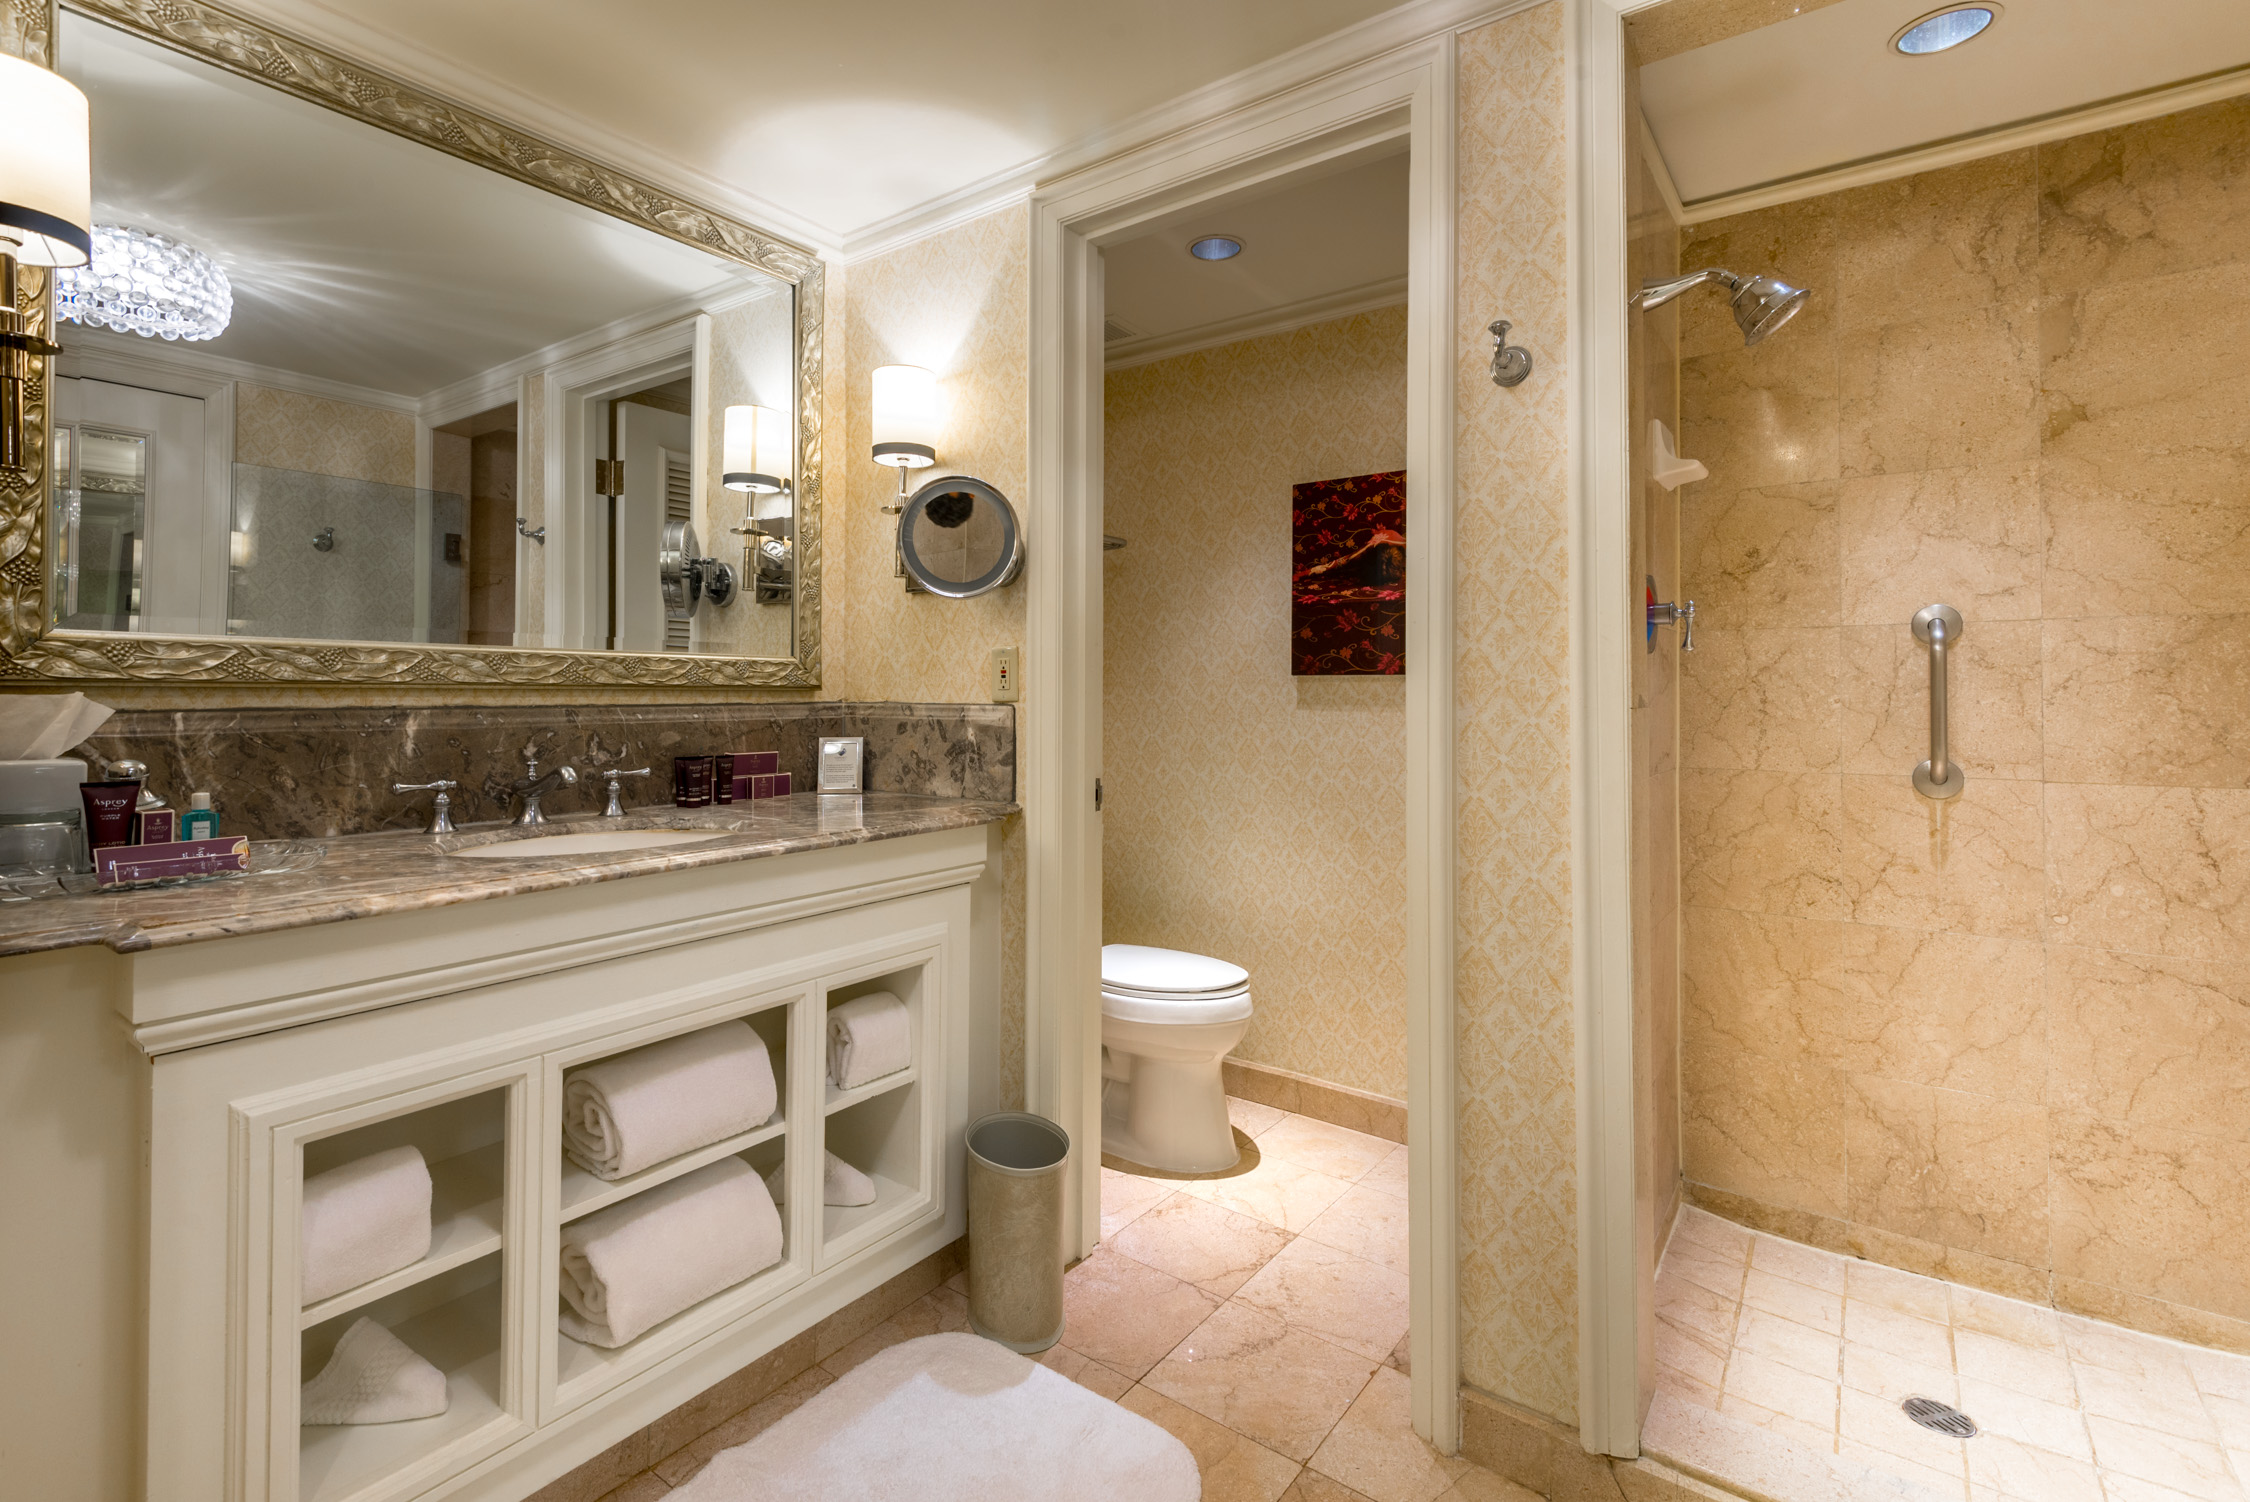 The bathroom inside our suite at The Ritz-Carlton, San Juan